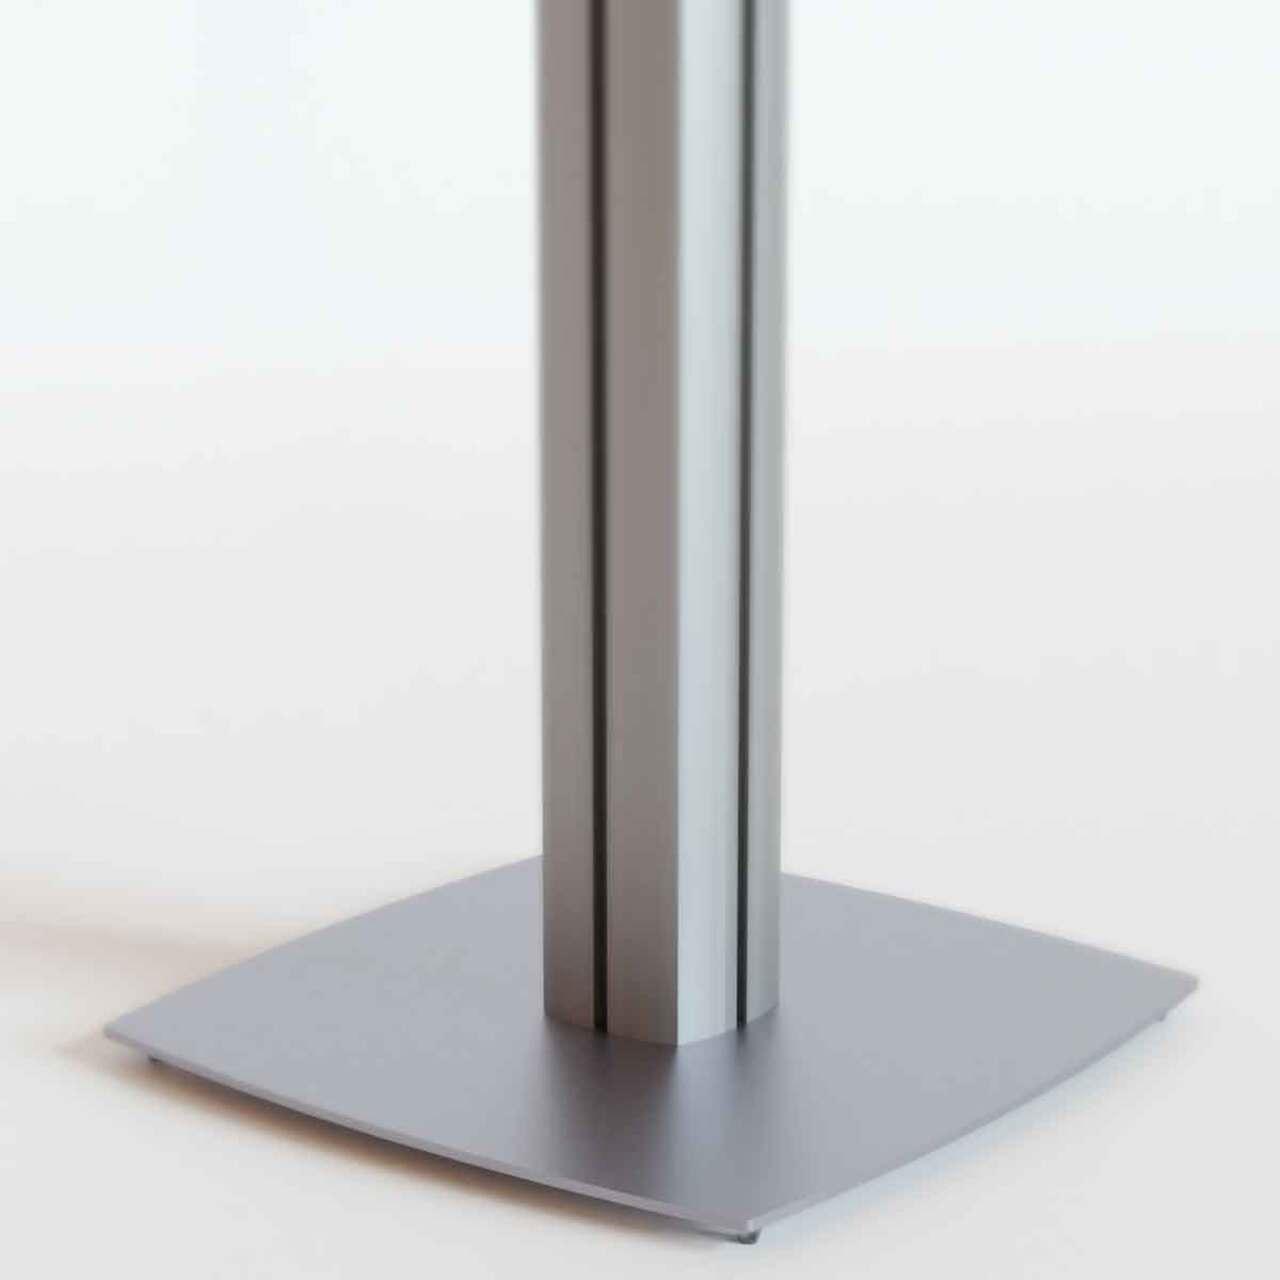 Urnă plexiglas transparent. cu picior, JJ DISPLAYS, dimensiuni la cerere